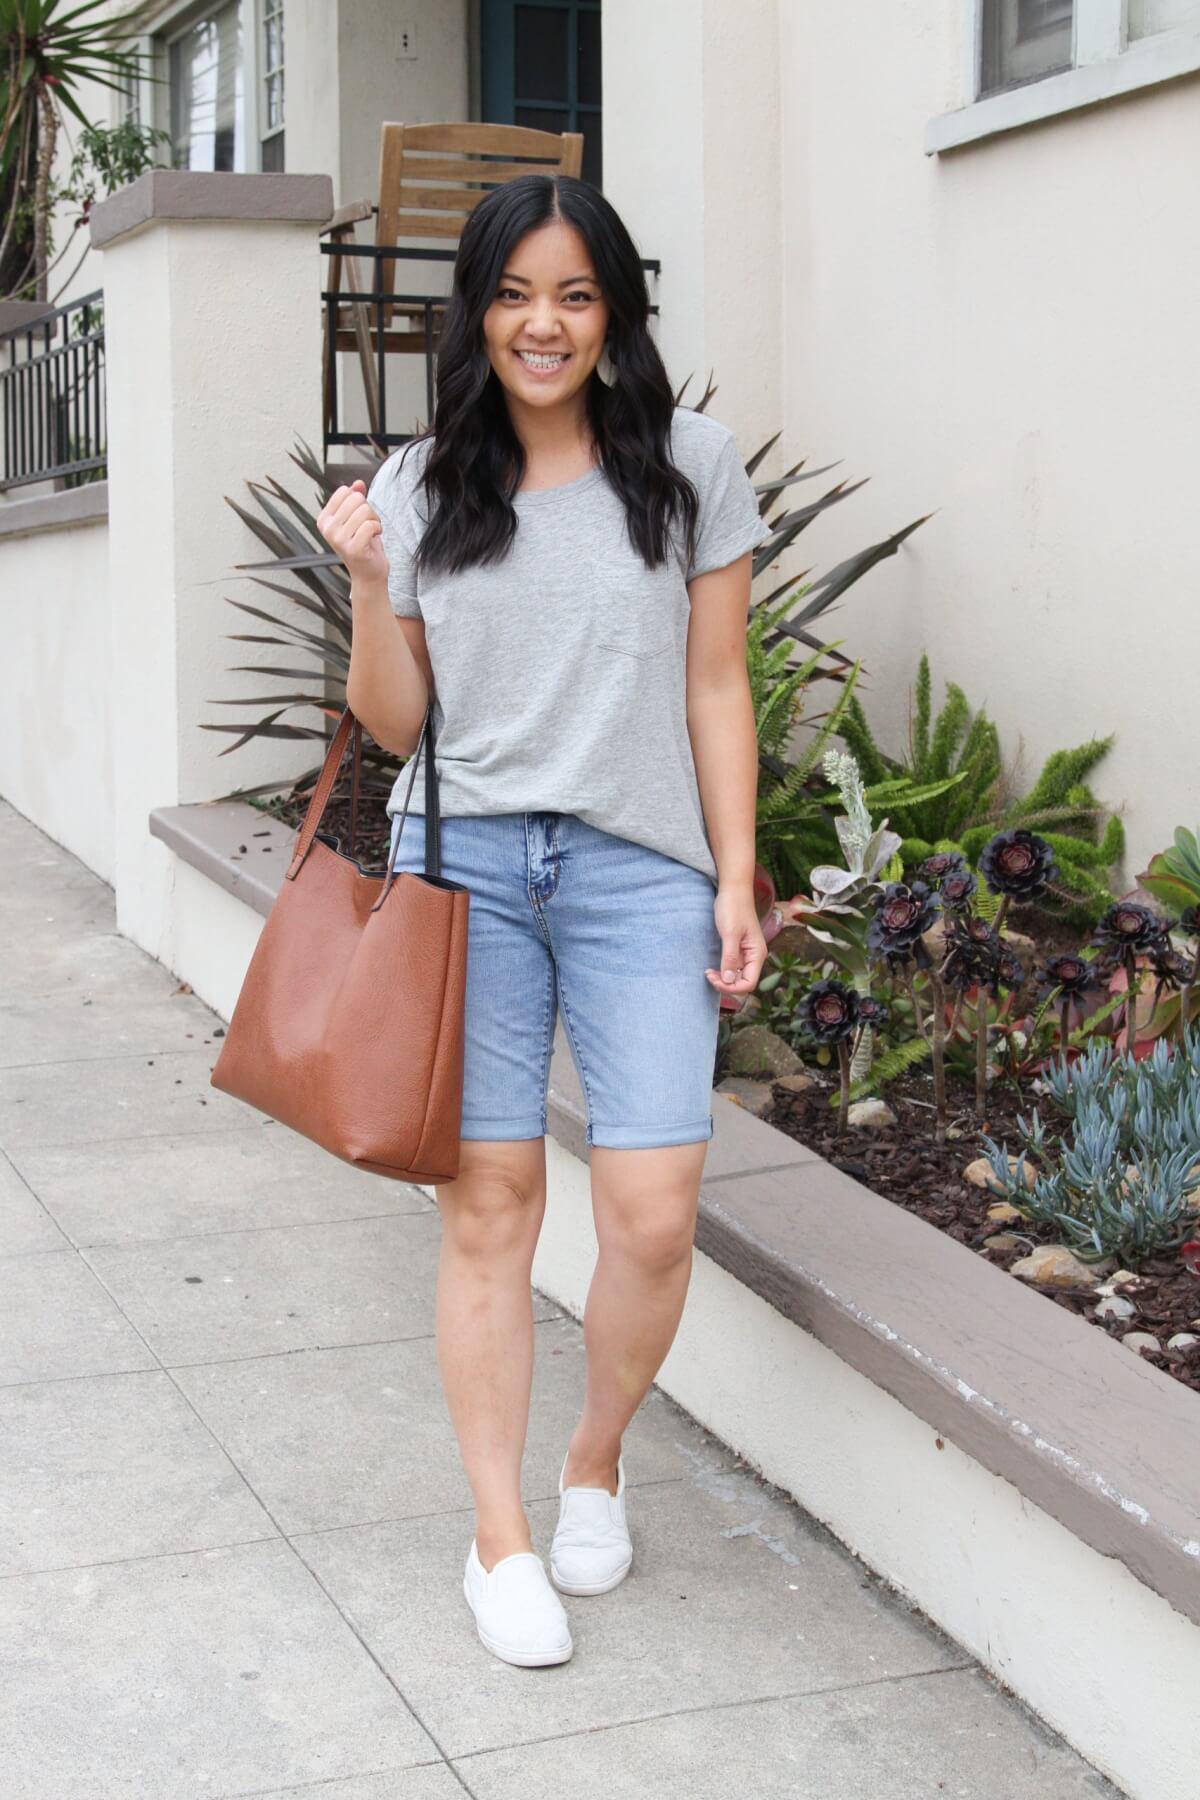 Casual Outfit: grey tee + denim bermuda shorts + white slip-on sneakers + white earrings + tan tote